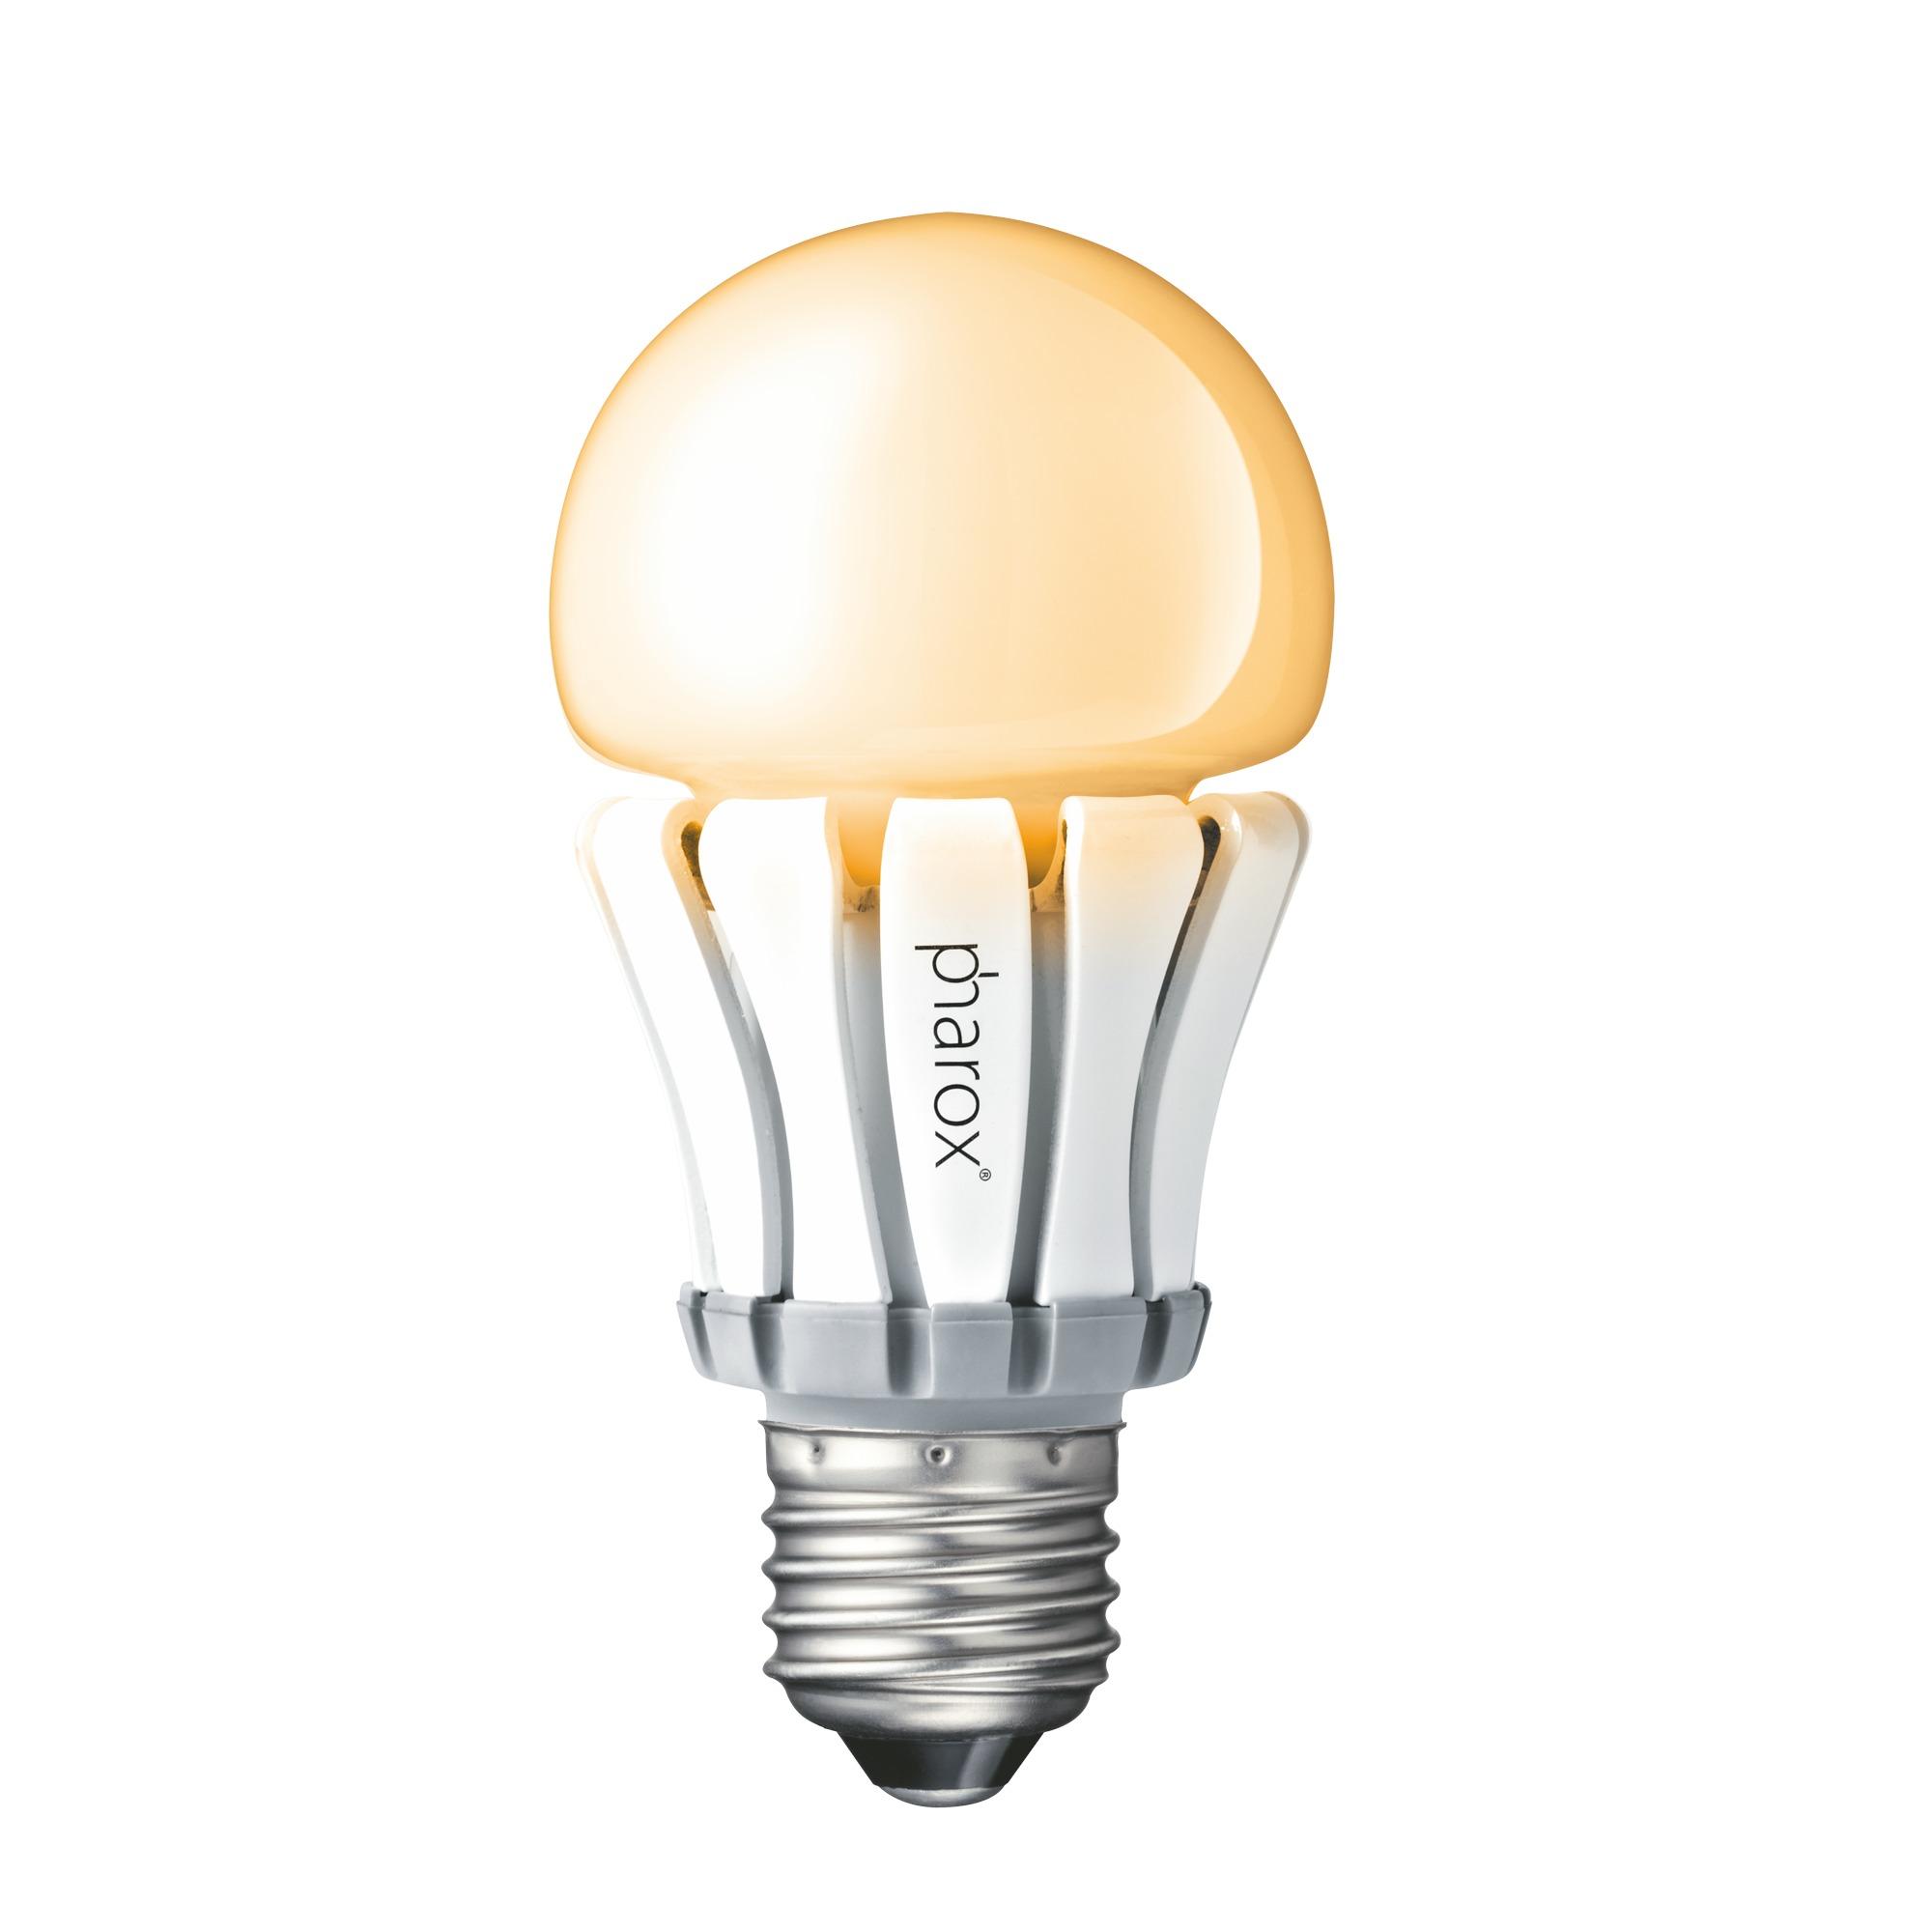 pharox ledlamp flame alle lampen lampen verlichting gamma. Black Bedroom Furniture Sets. Home Design Ideas